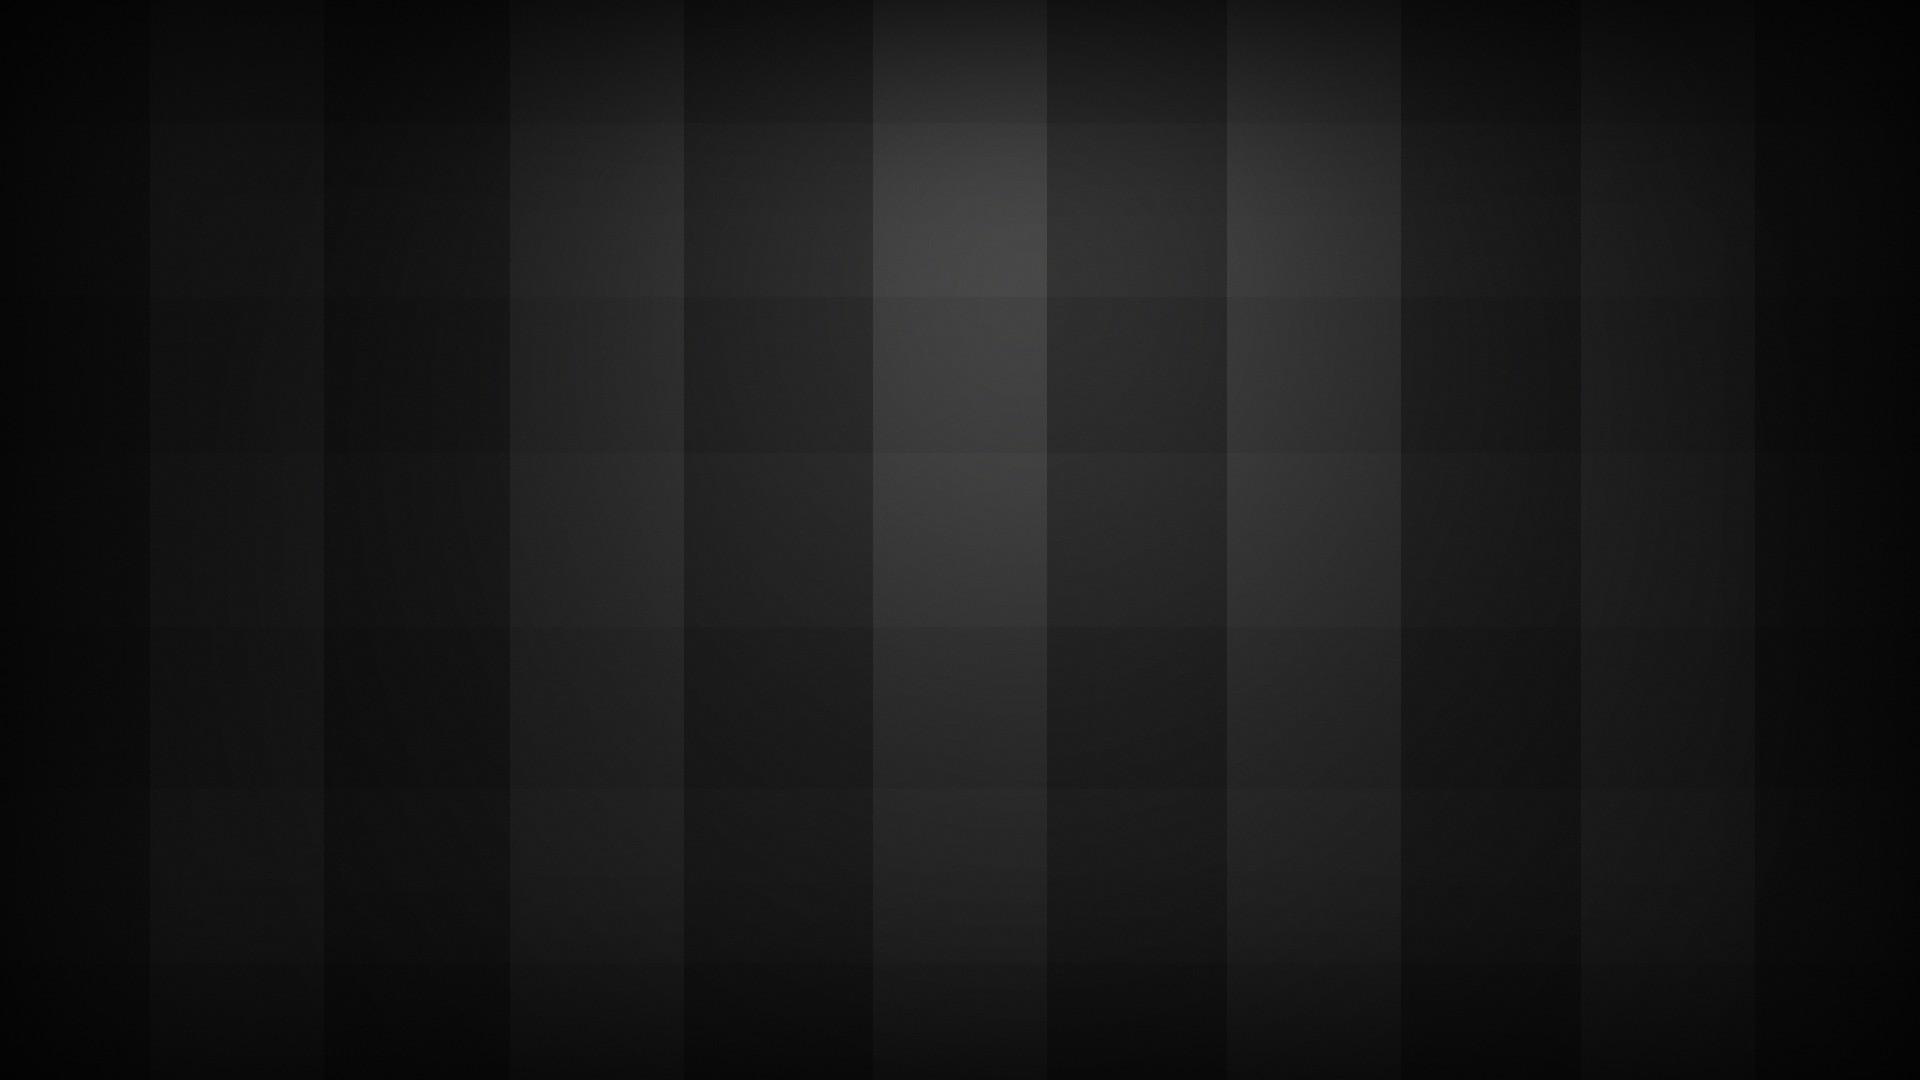 Black Color Wallpaper – HD Wallpapers Pretty